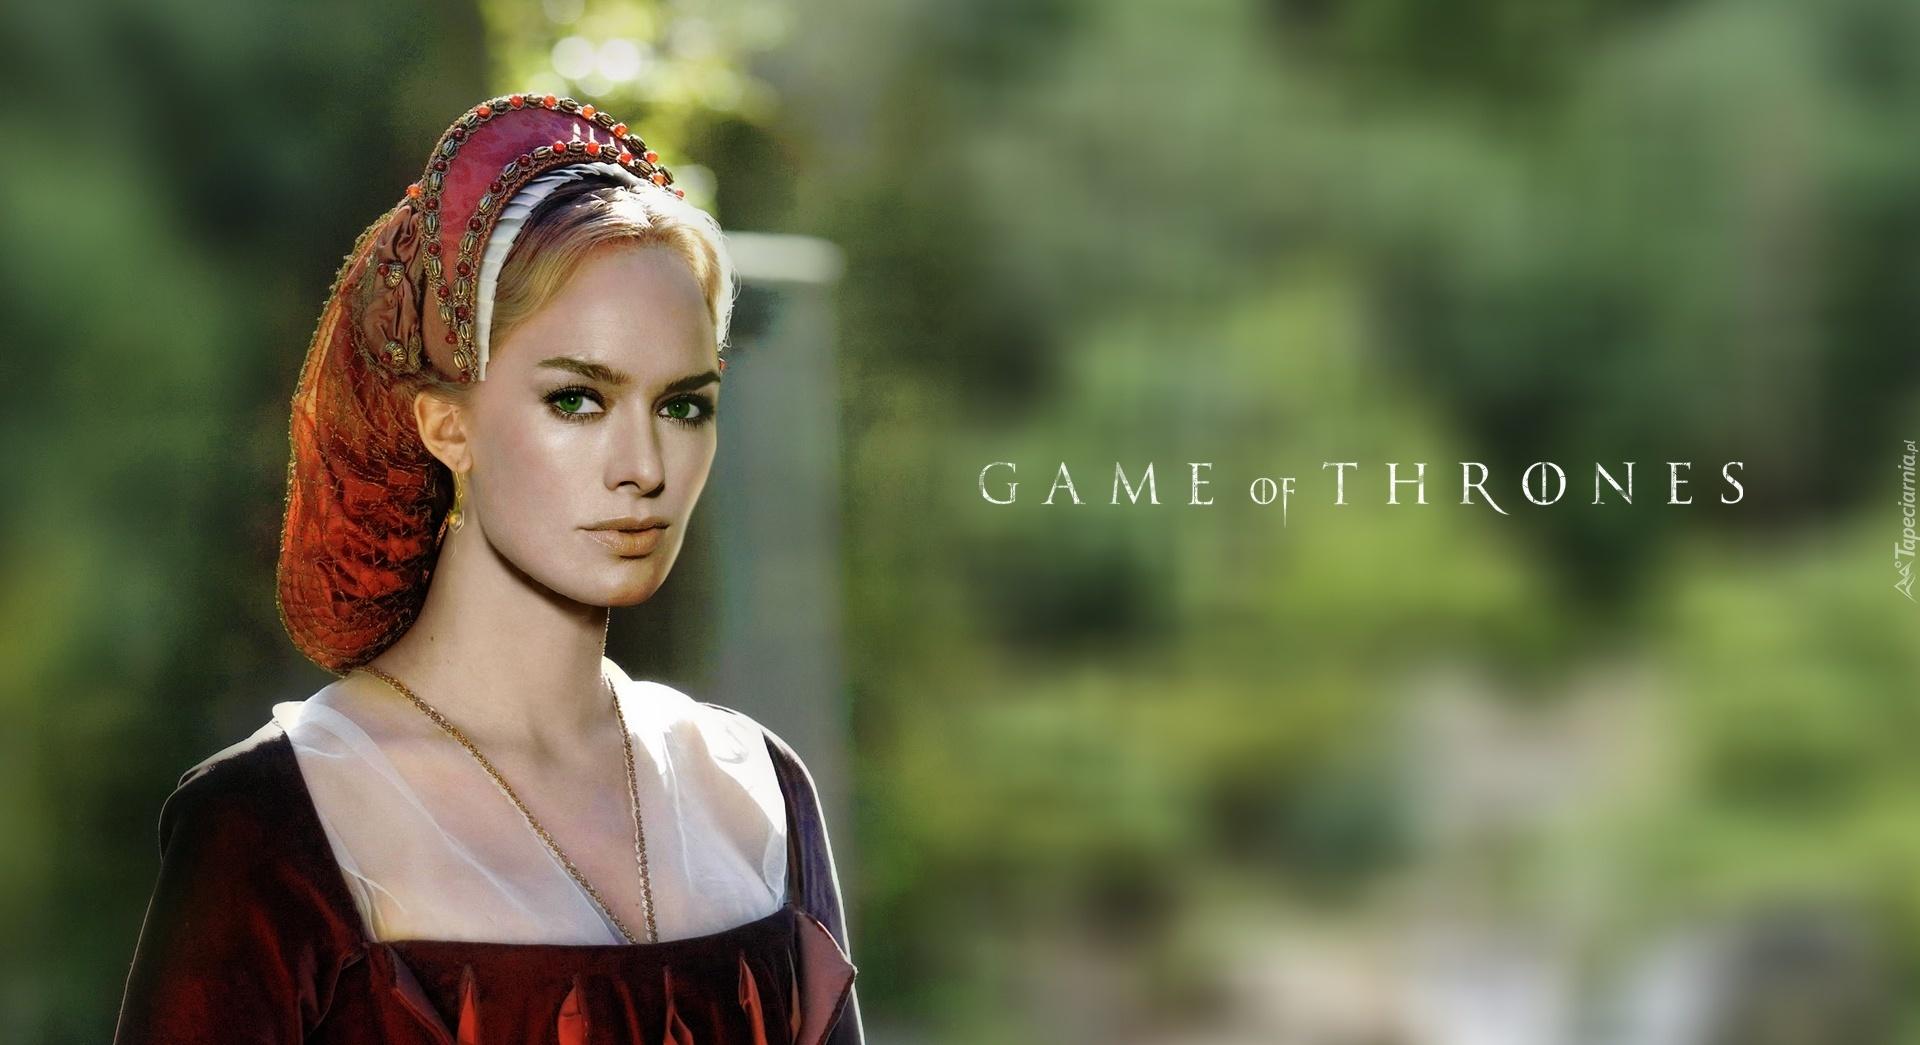 gra o tron, game of thrones, królowa, cersei lannister - lena headey